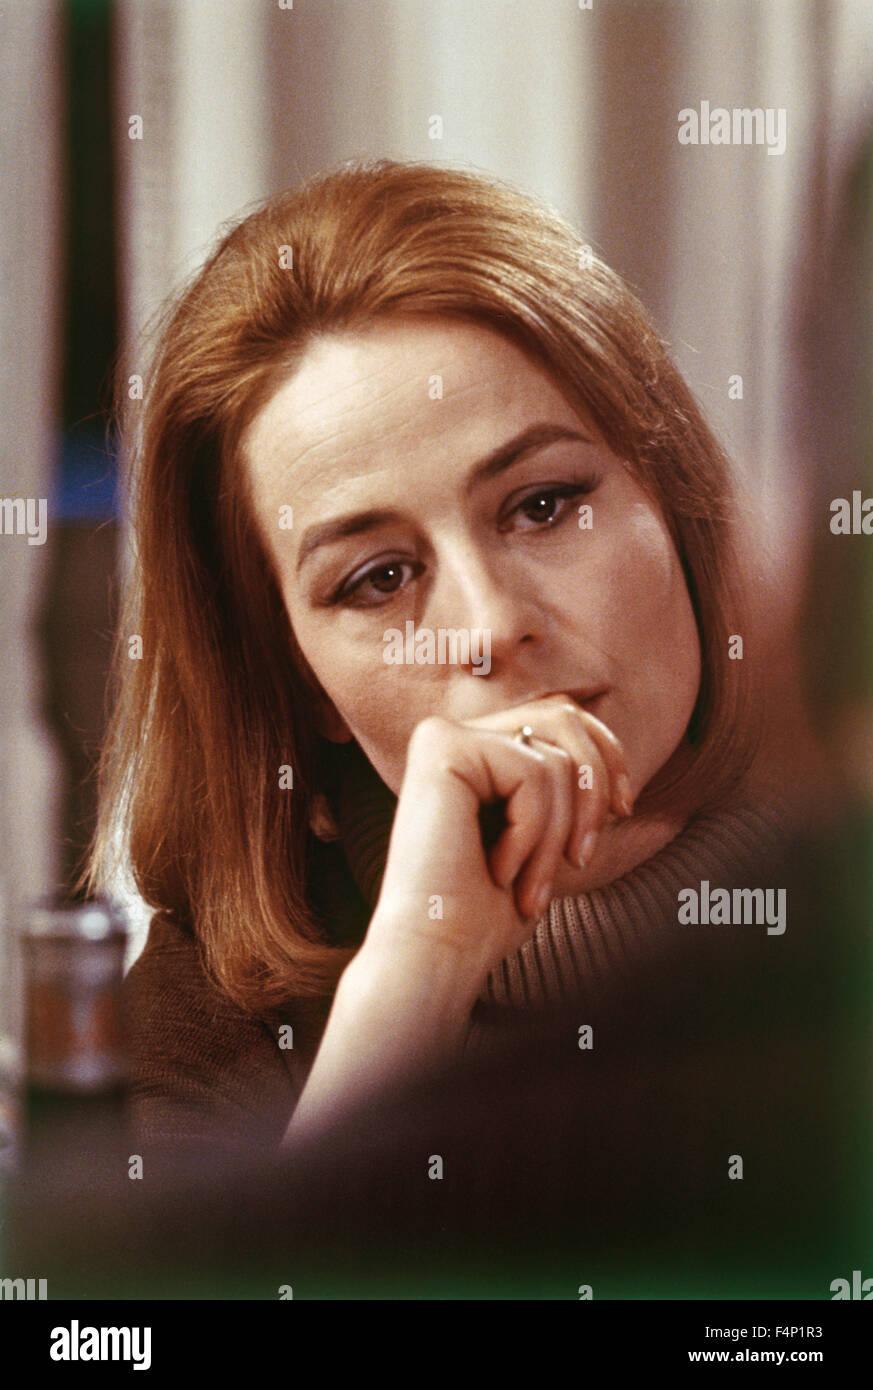 Annie Girardot / Vivre pour vivre 1967 dirigida por Claude Lelouch Foto de stock